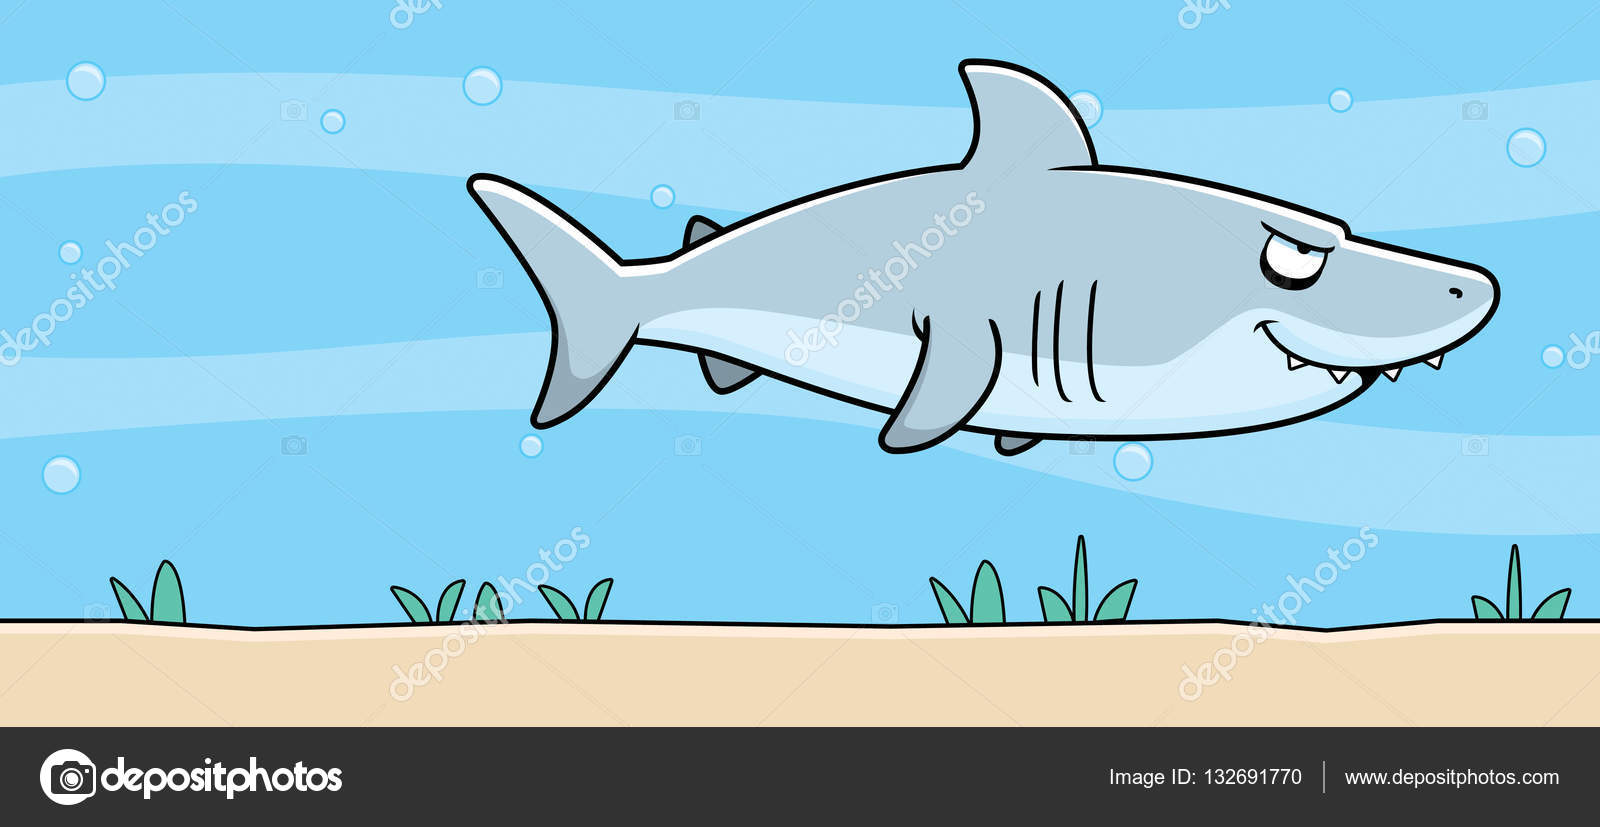 Fotos De Tiburones De Dibujos Imagui